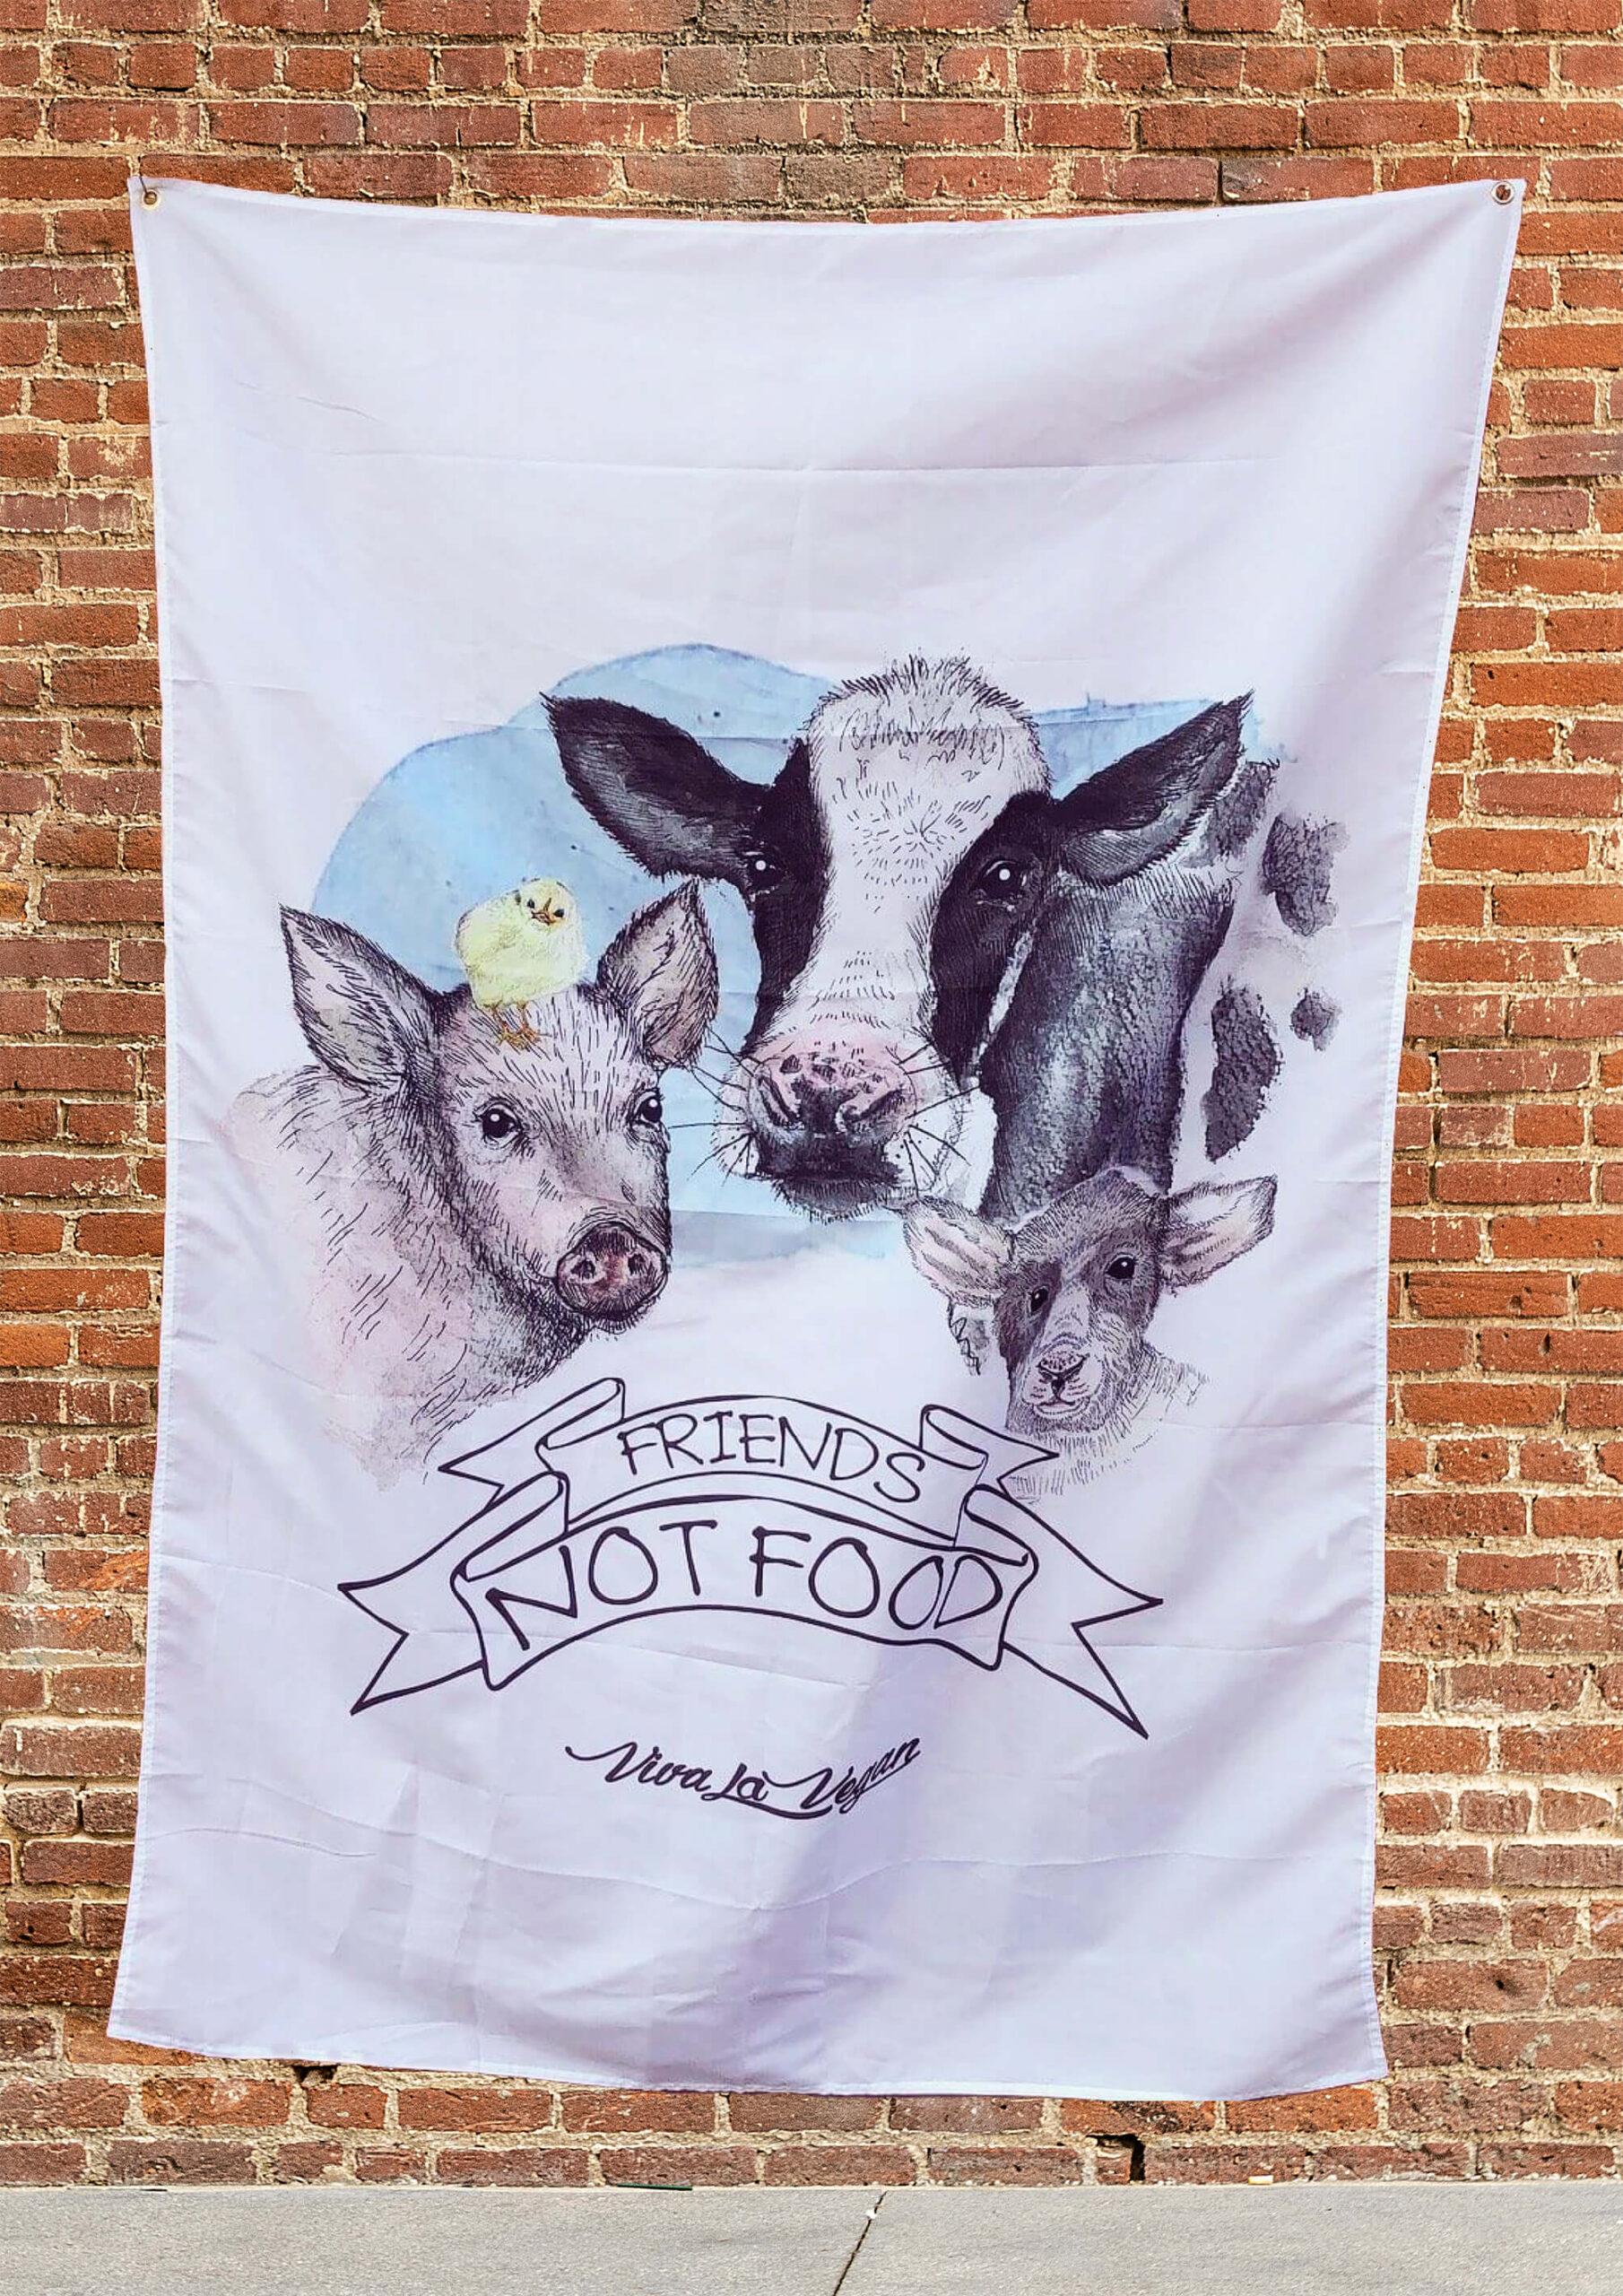 Vegan statement flag- friends not ffod design by Eco-ethical brand Viva La Vegan